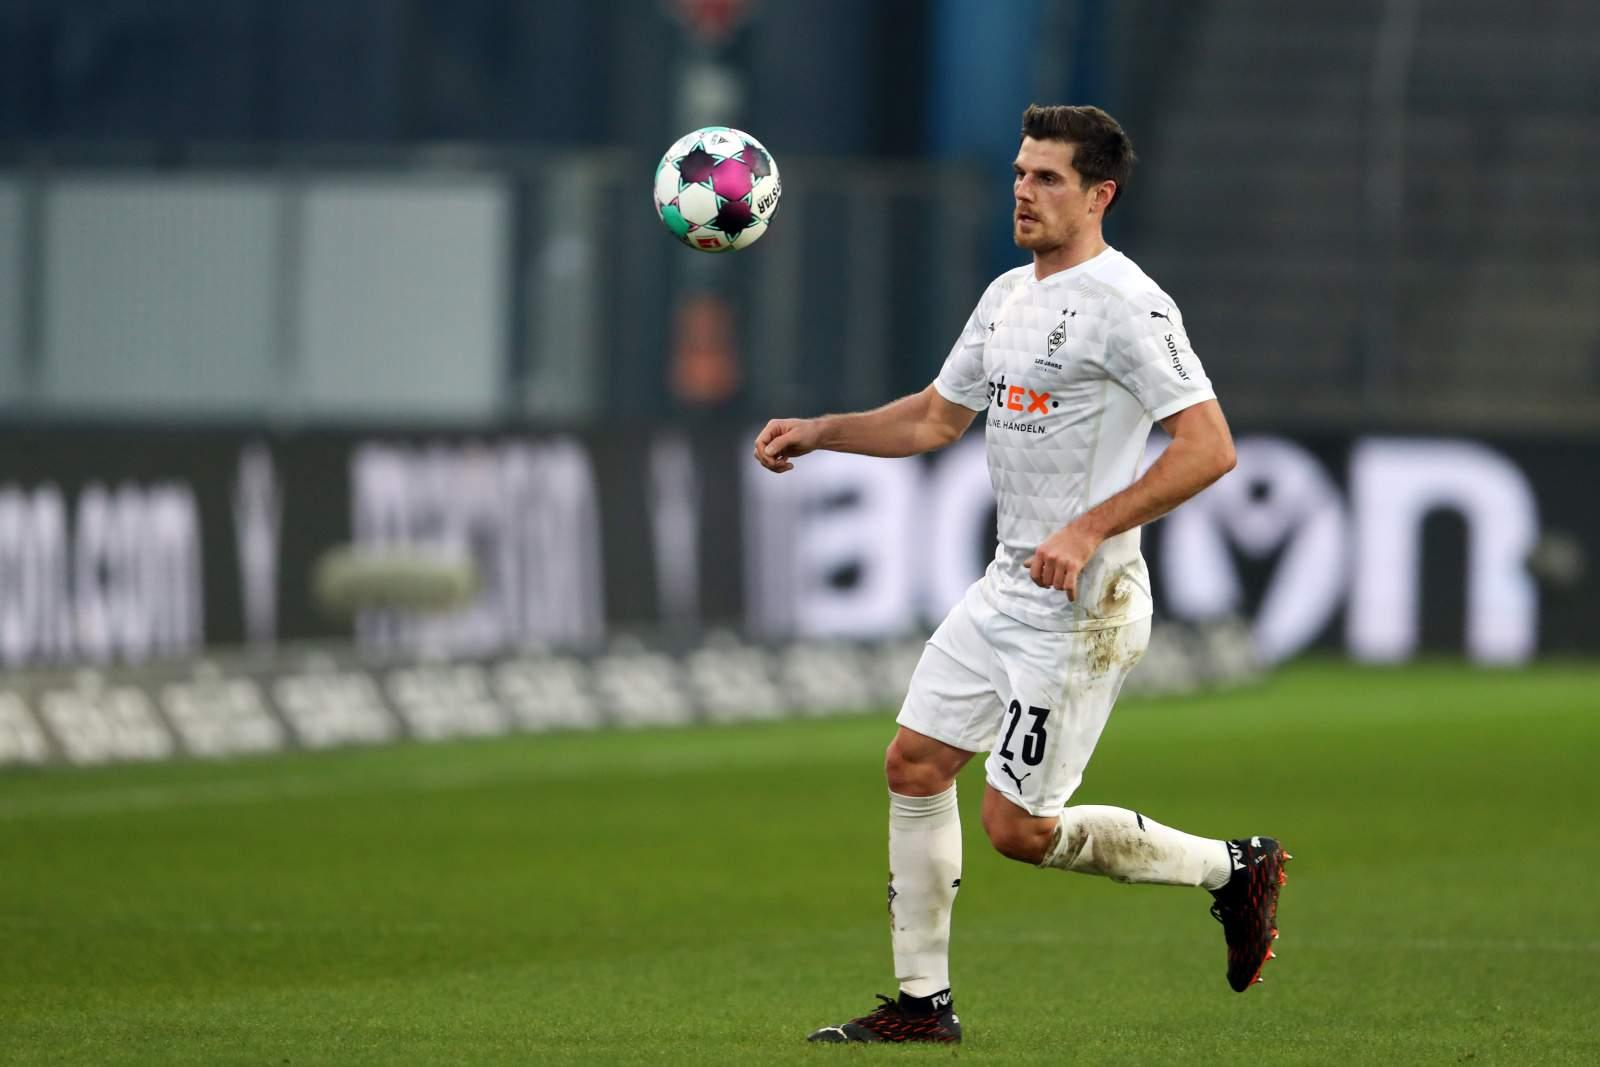 «Бавария» проиграла в Мёнхенгладбахе, ведя в счёте 2:0